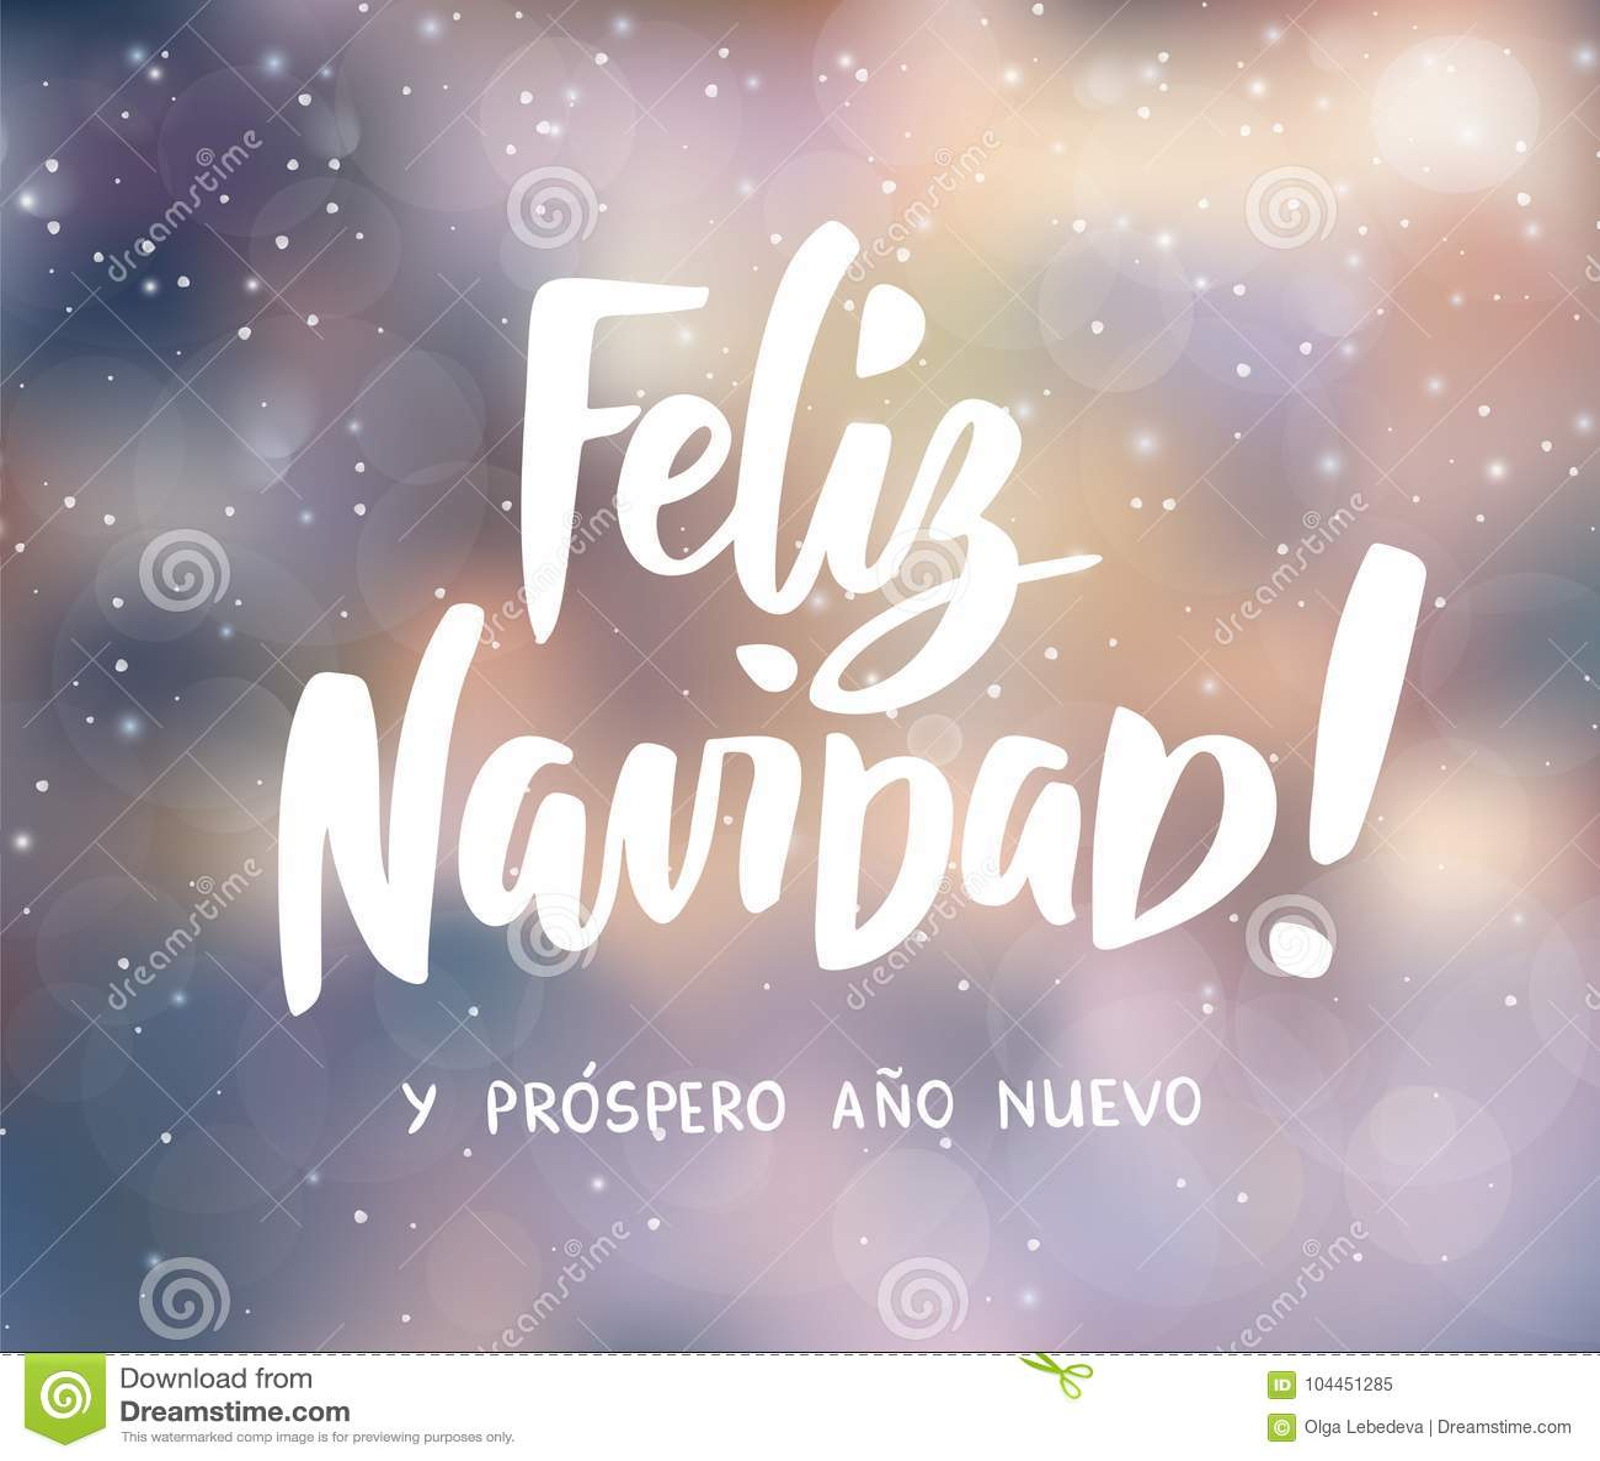 Feliz Navidad Joyeux Noel 2019.Feliz Navidad Y Prospero Ano Nuevo Le Joyeux Noel Et La